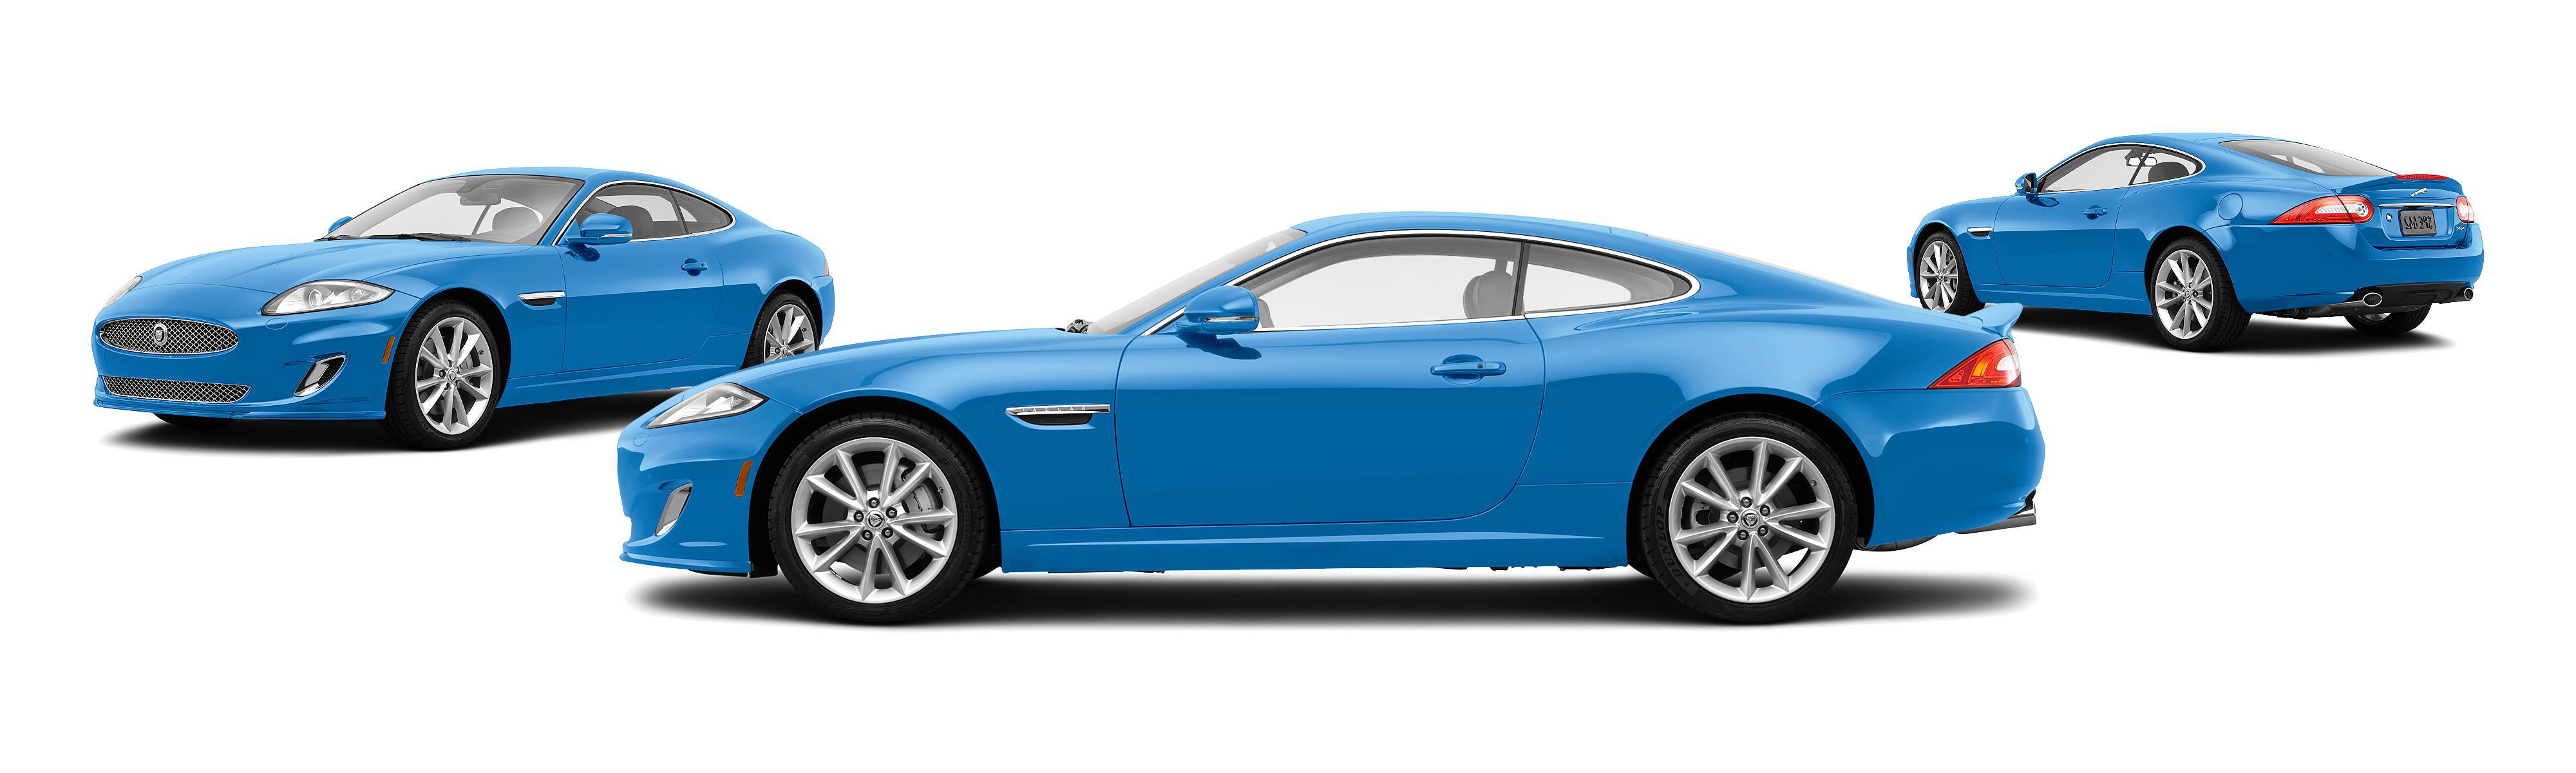 auto the preview at cars of show jaguar new a classic sedan sneak york xj april